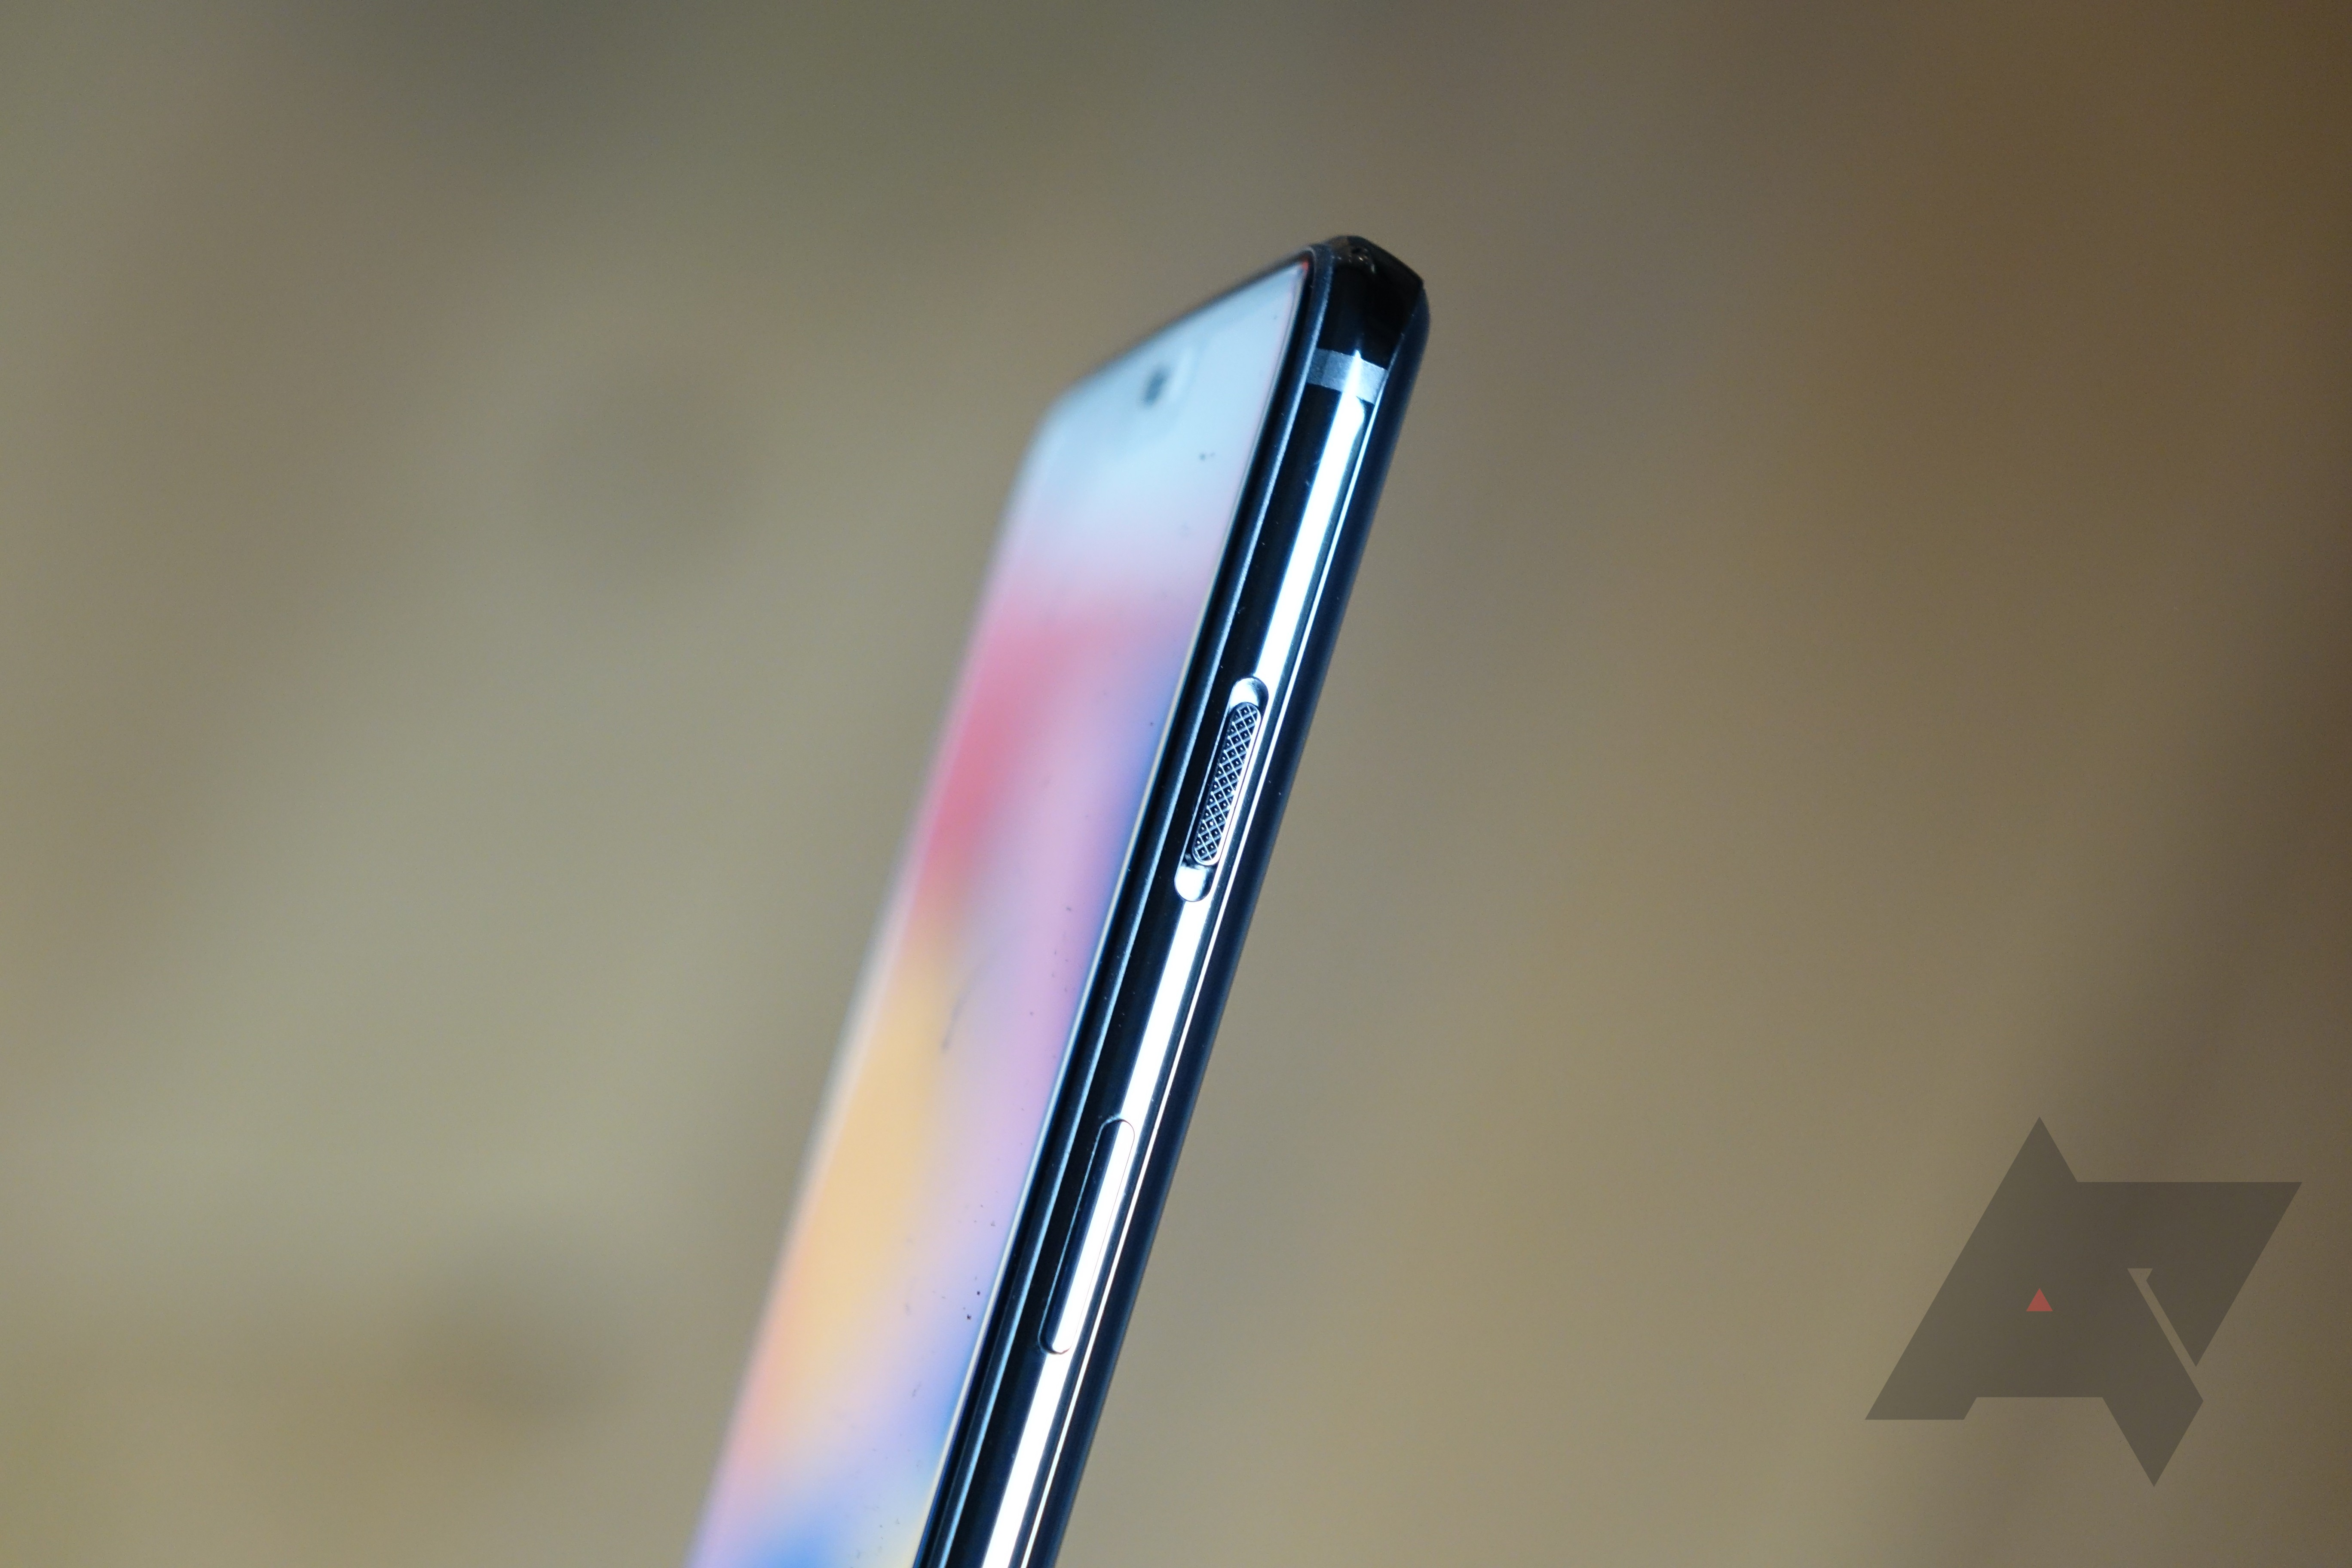 The OnePlus 6's alert slider key finally works like it